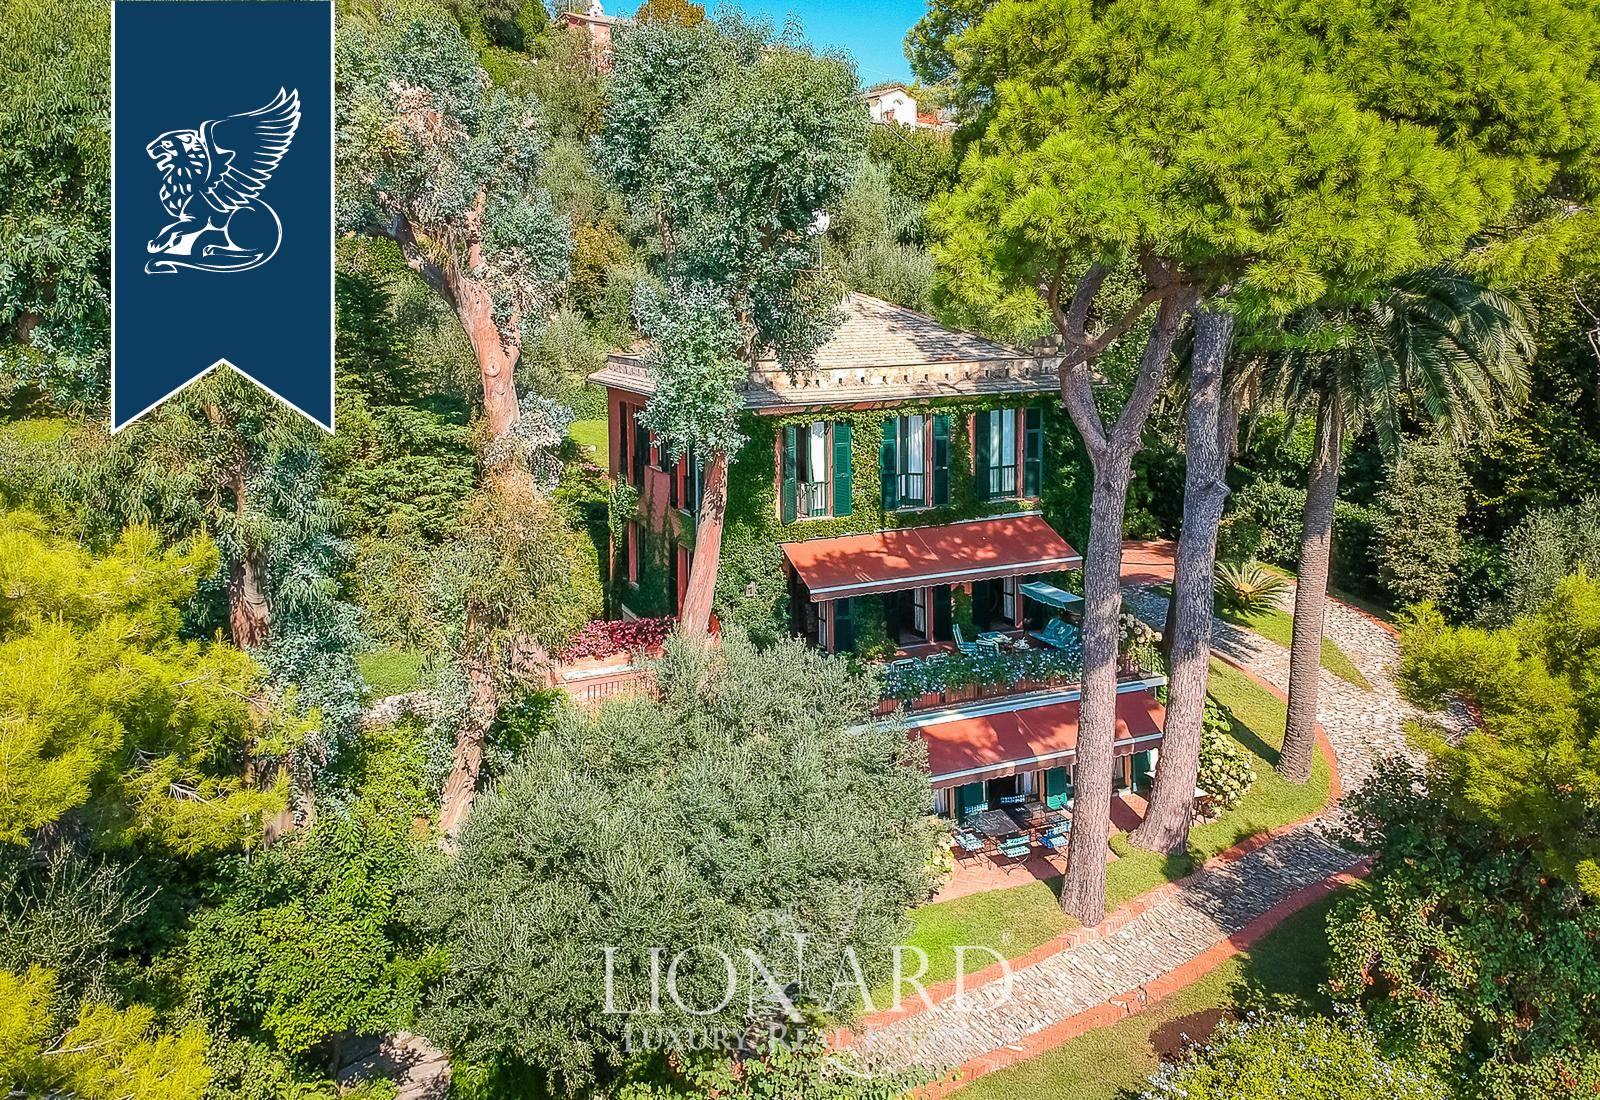 Villa in Vendita a Santa Margherita Ligure: 0 locali, 459 mq - Foto 9